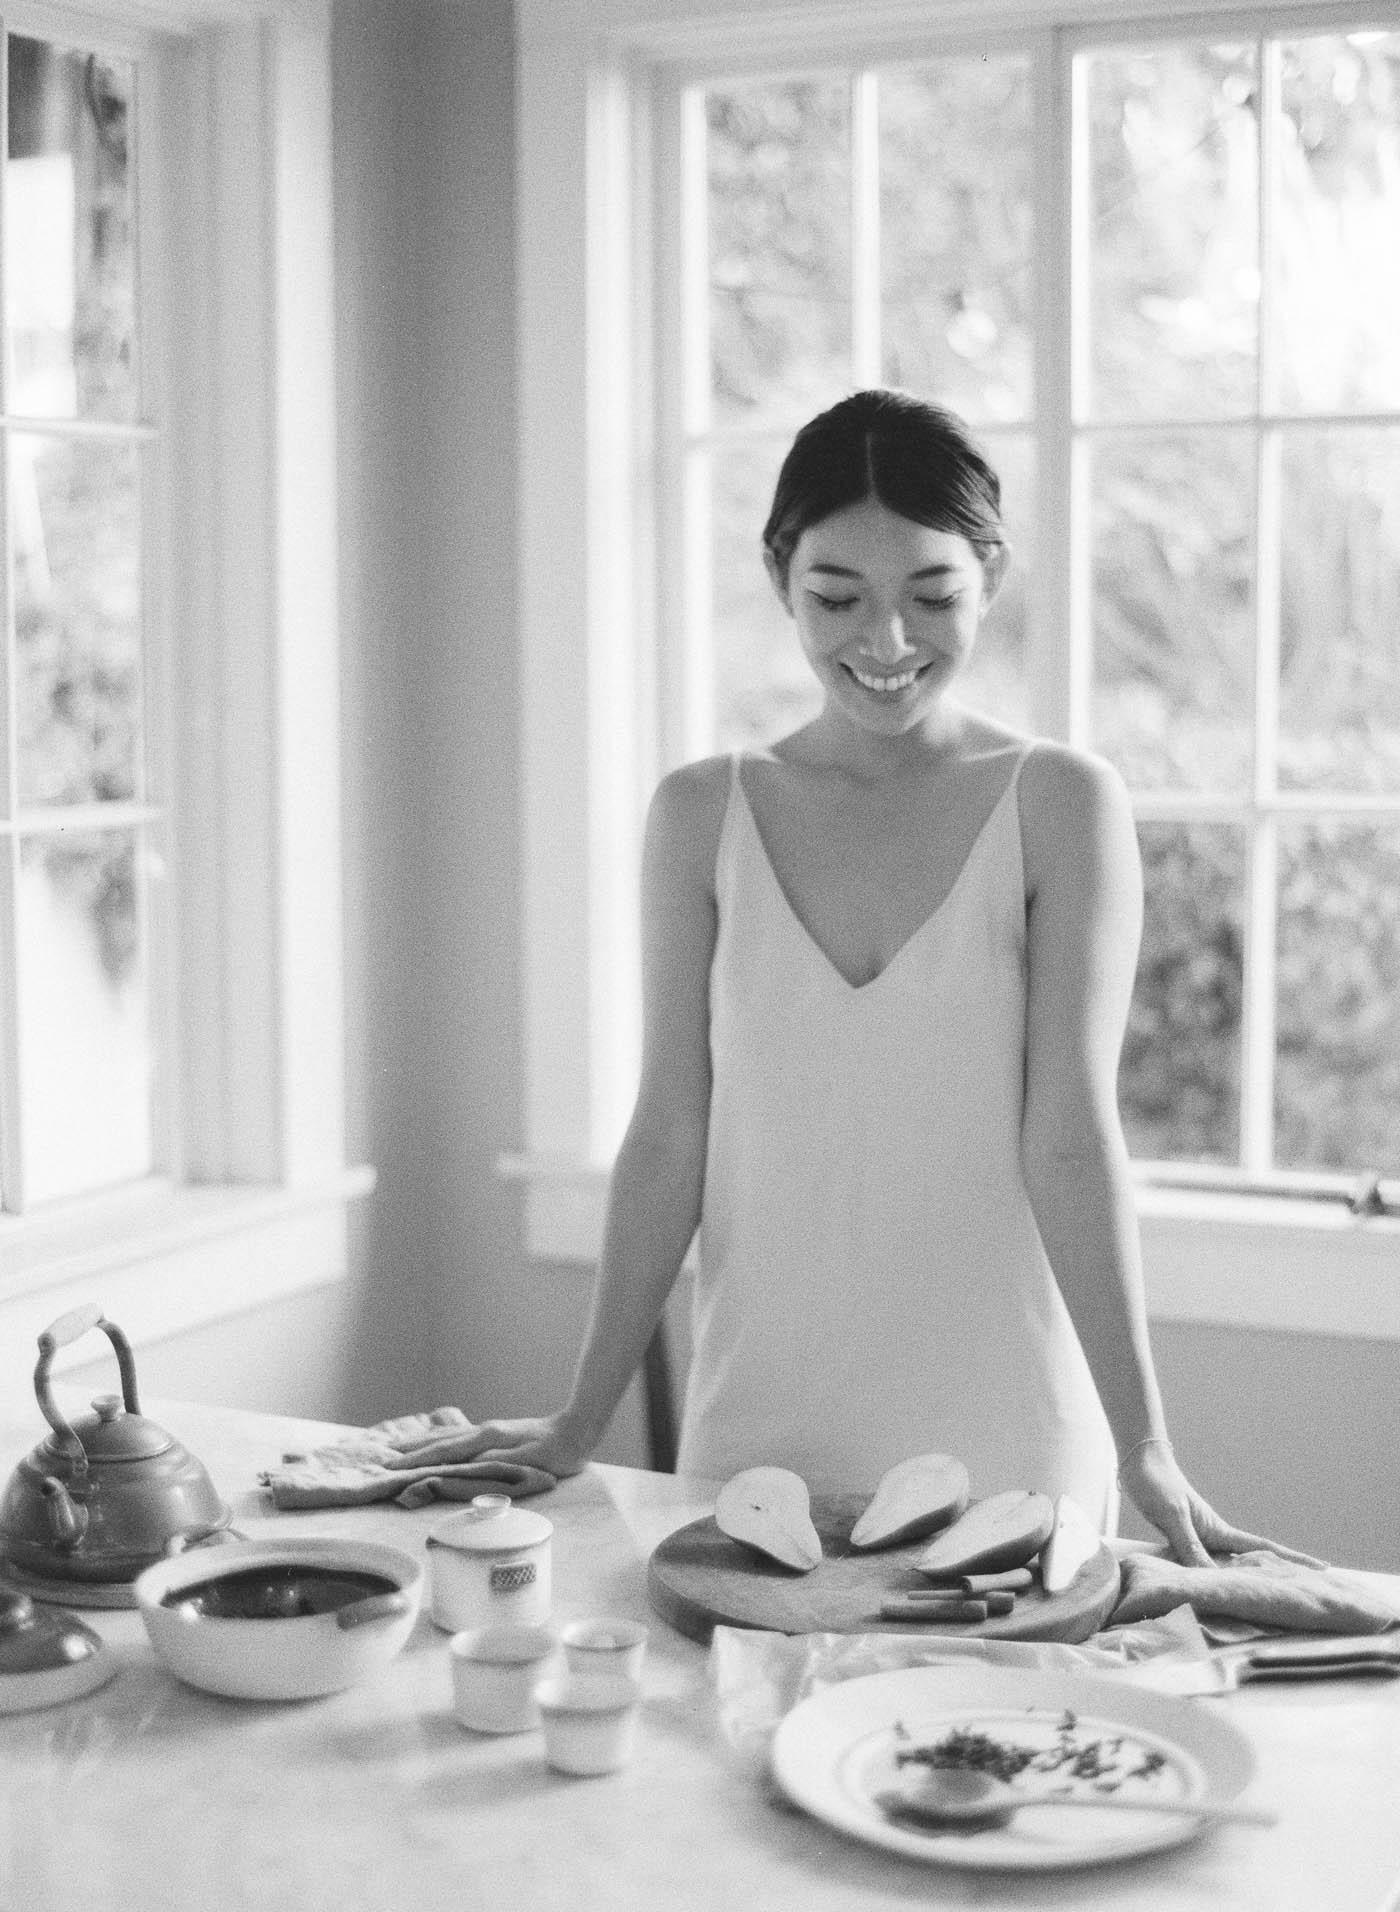 riviera-house-engagement-106-Jen_Huang-Tea-Ceremony-346-Jen_Huang-000006620001.jpg